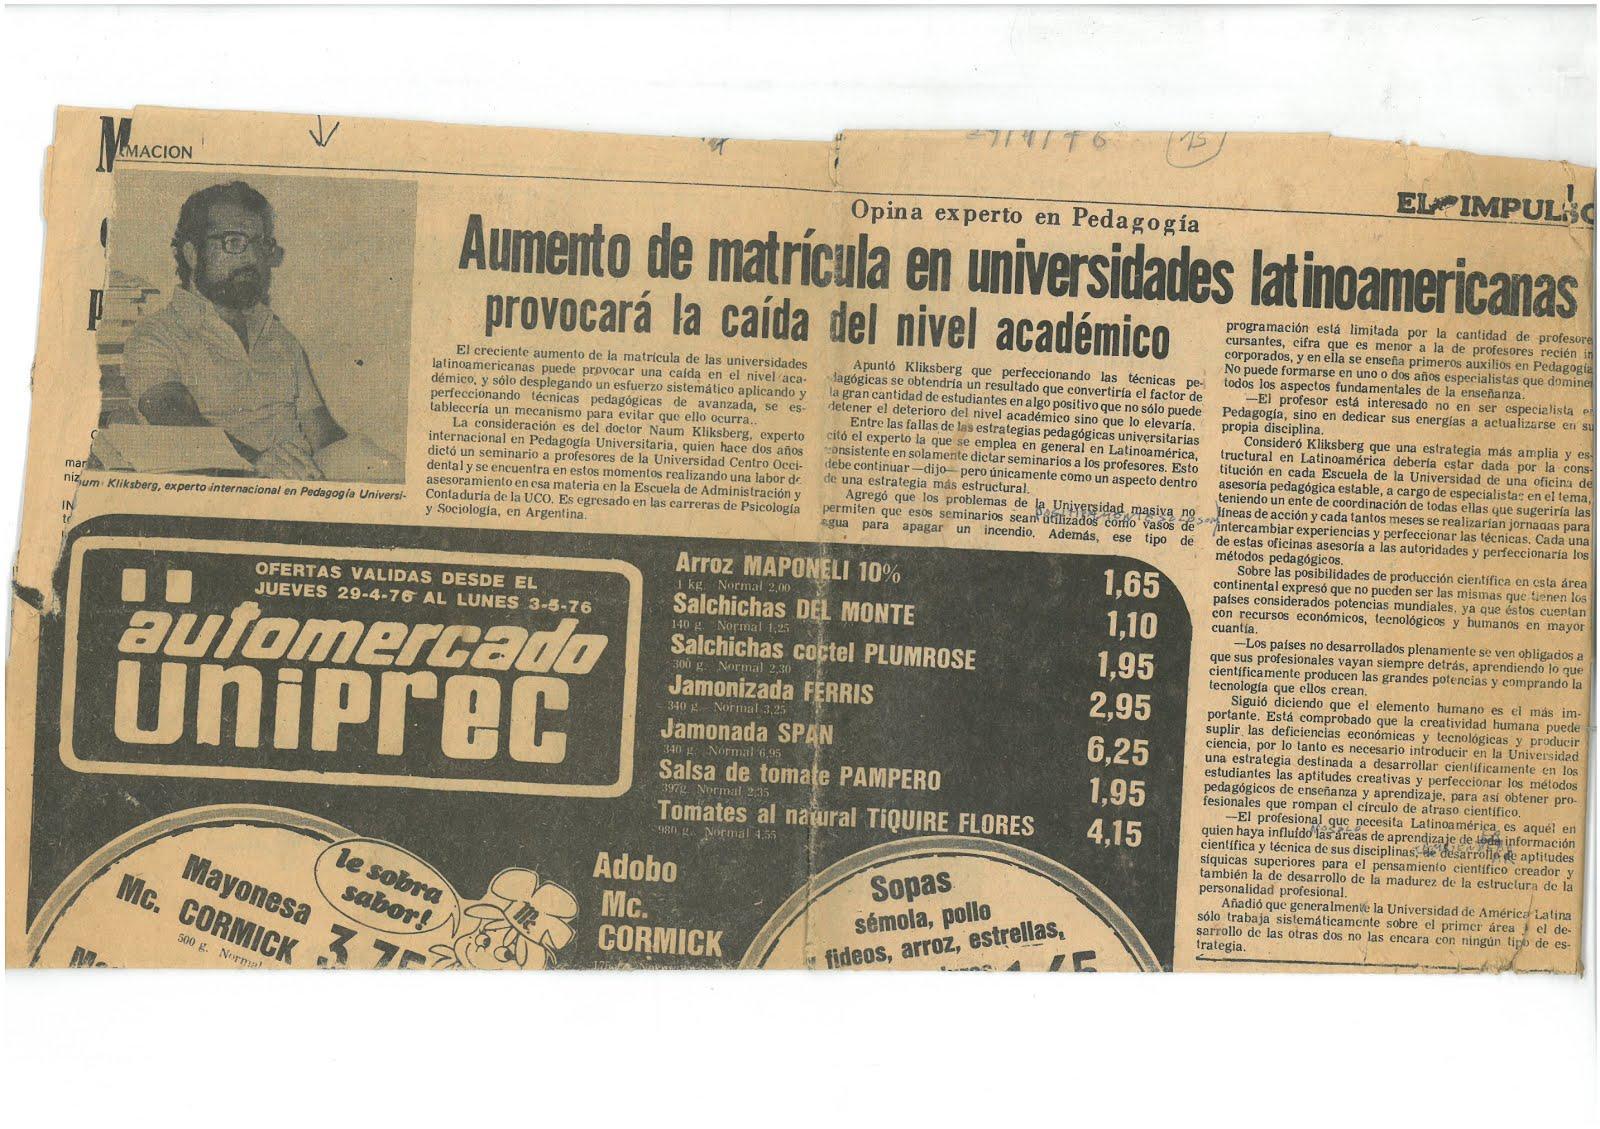 25- PERIODICO EL IMPULSO, VENEZUELA, 29/4/1976.. REPORTAJE A NAUM KLIKSBERG